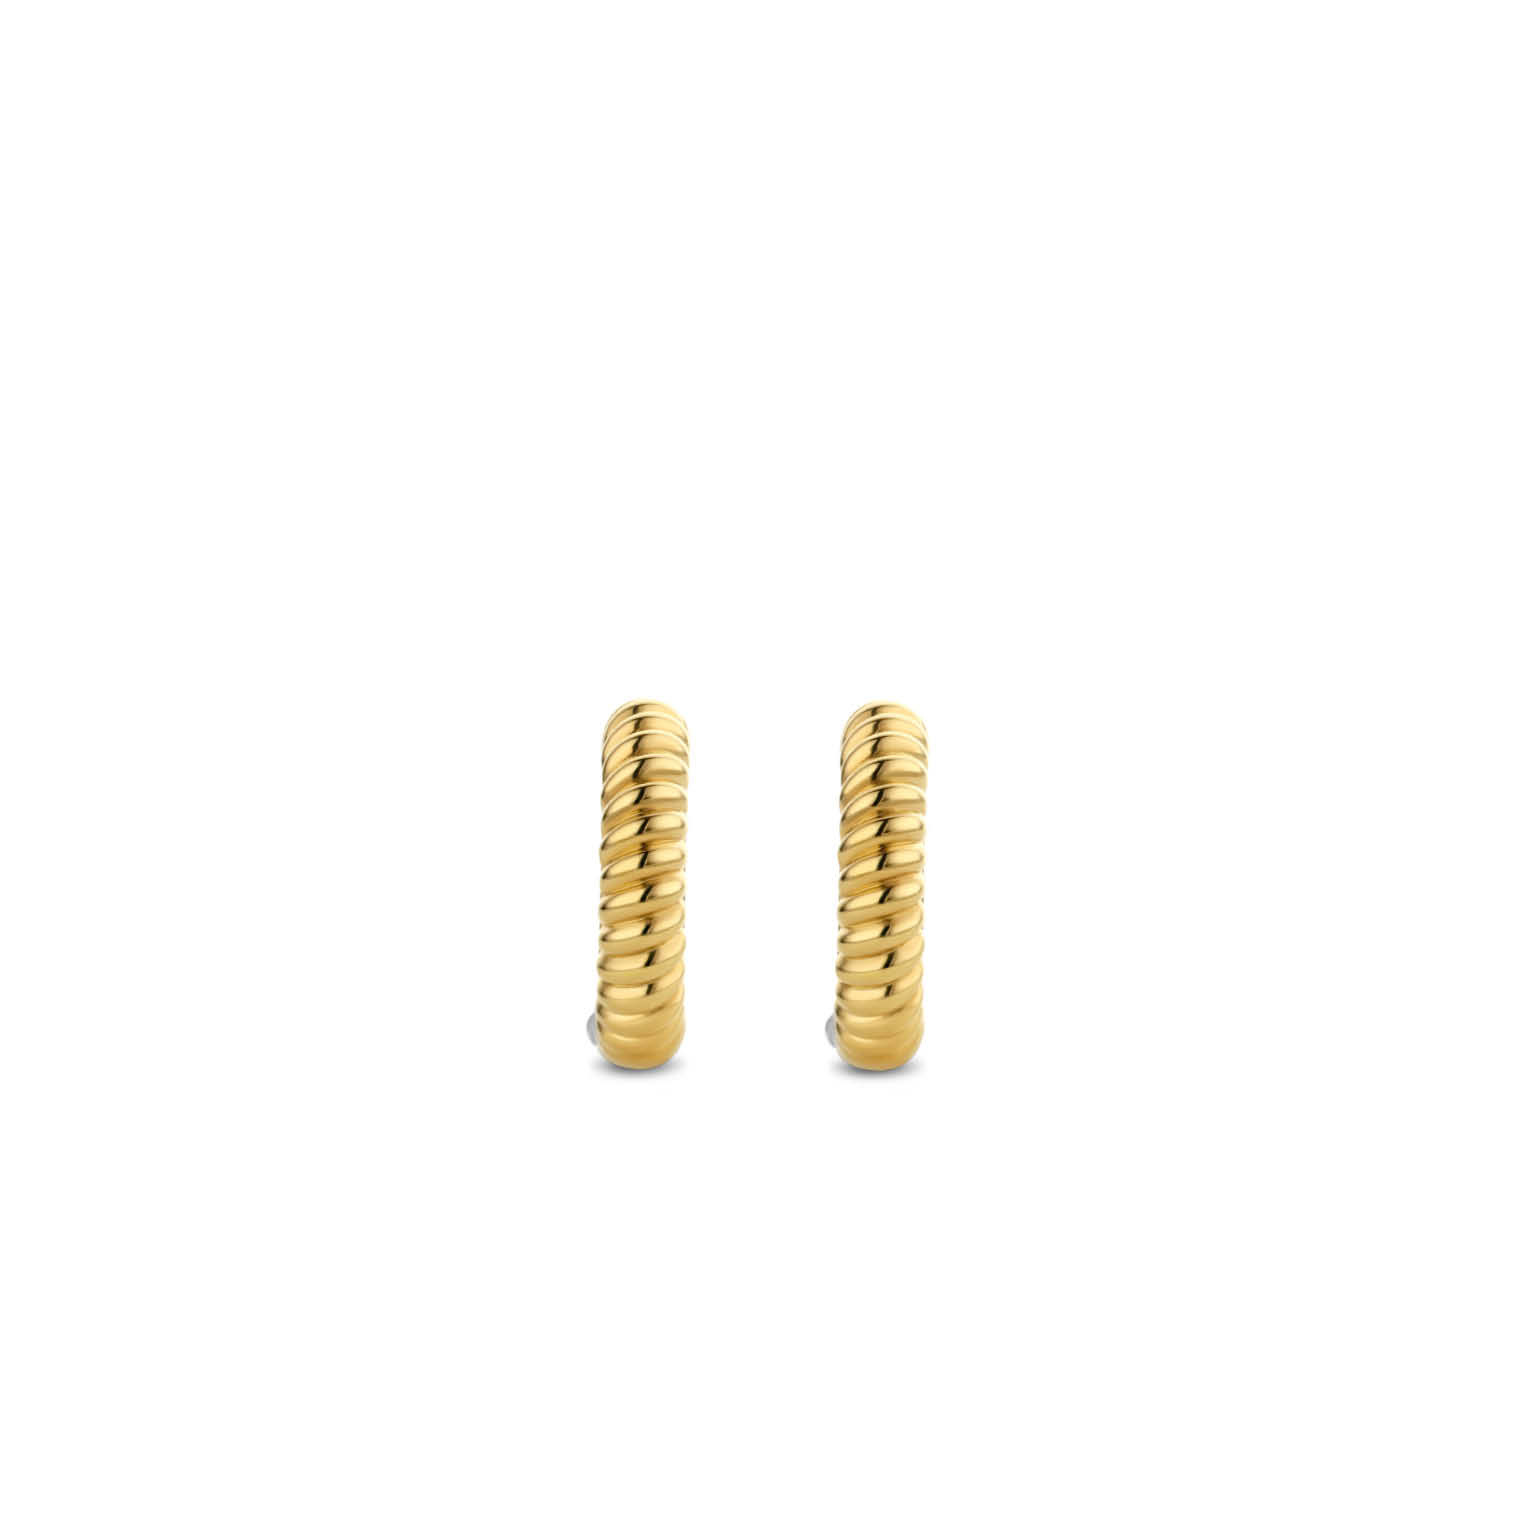 TI SENTO - Milano Earrings 7210YT-2